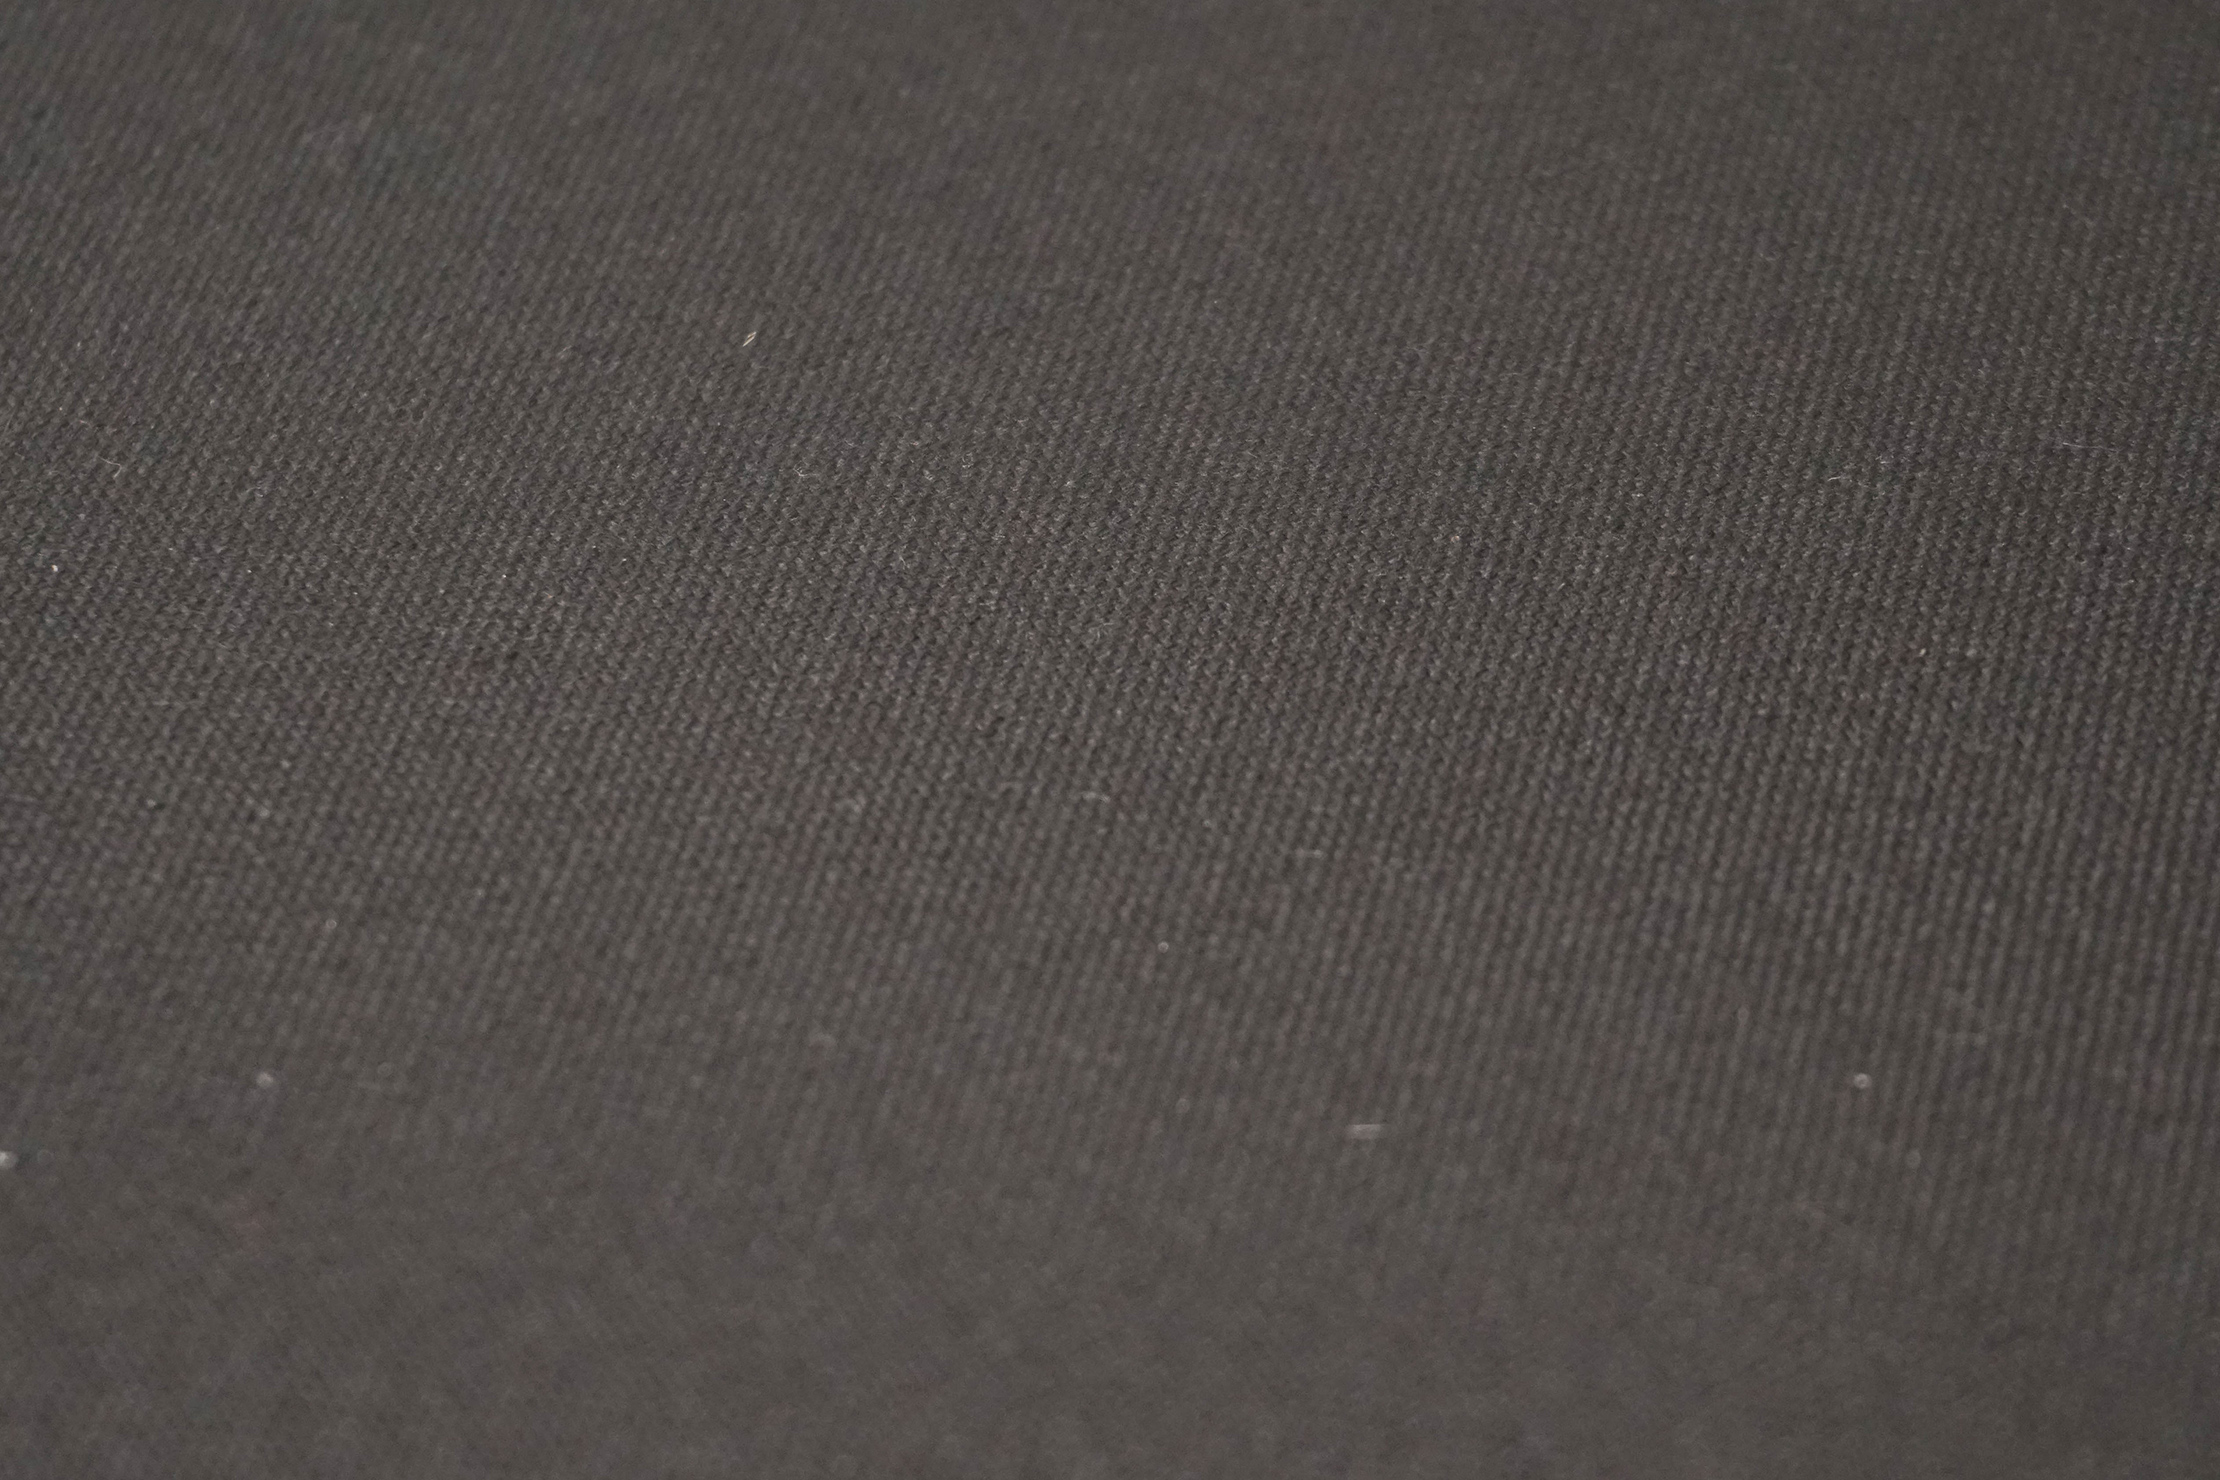 Osprey Arcane Brief Material